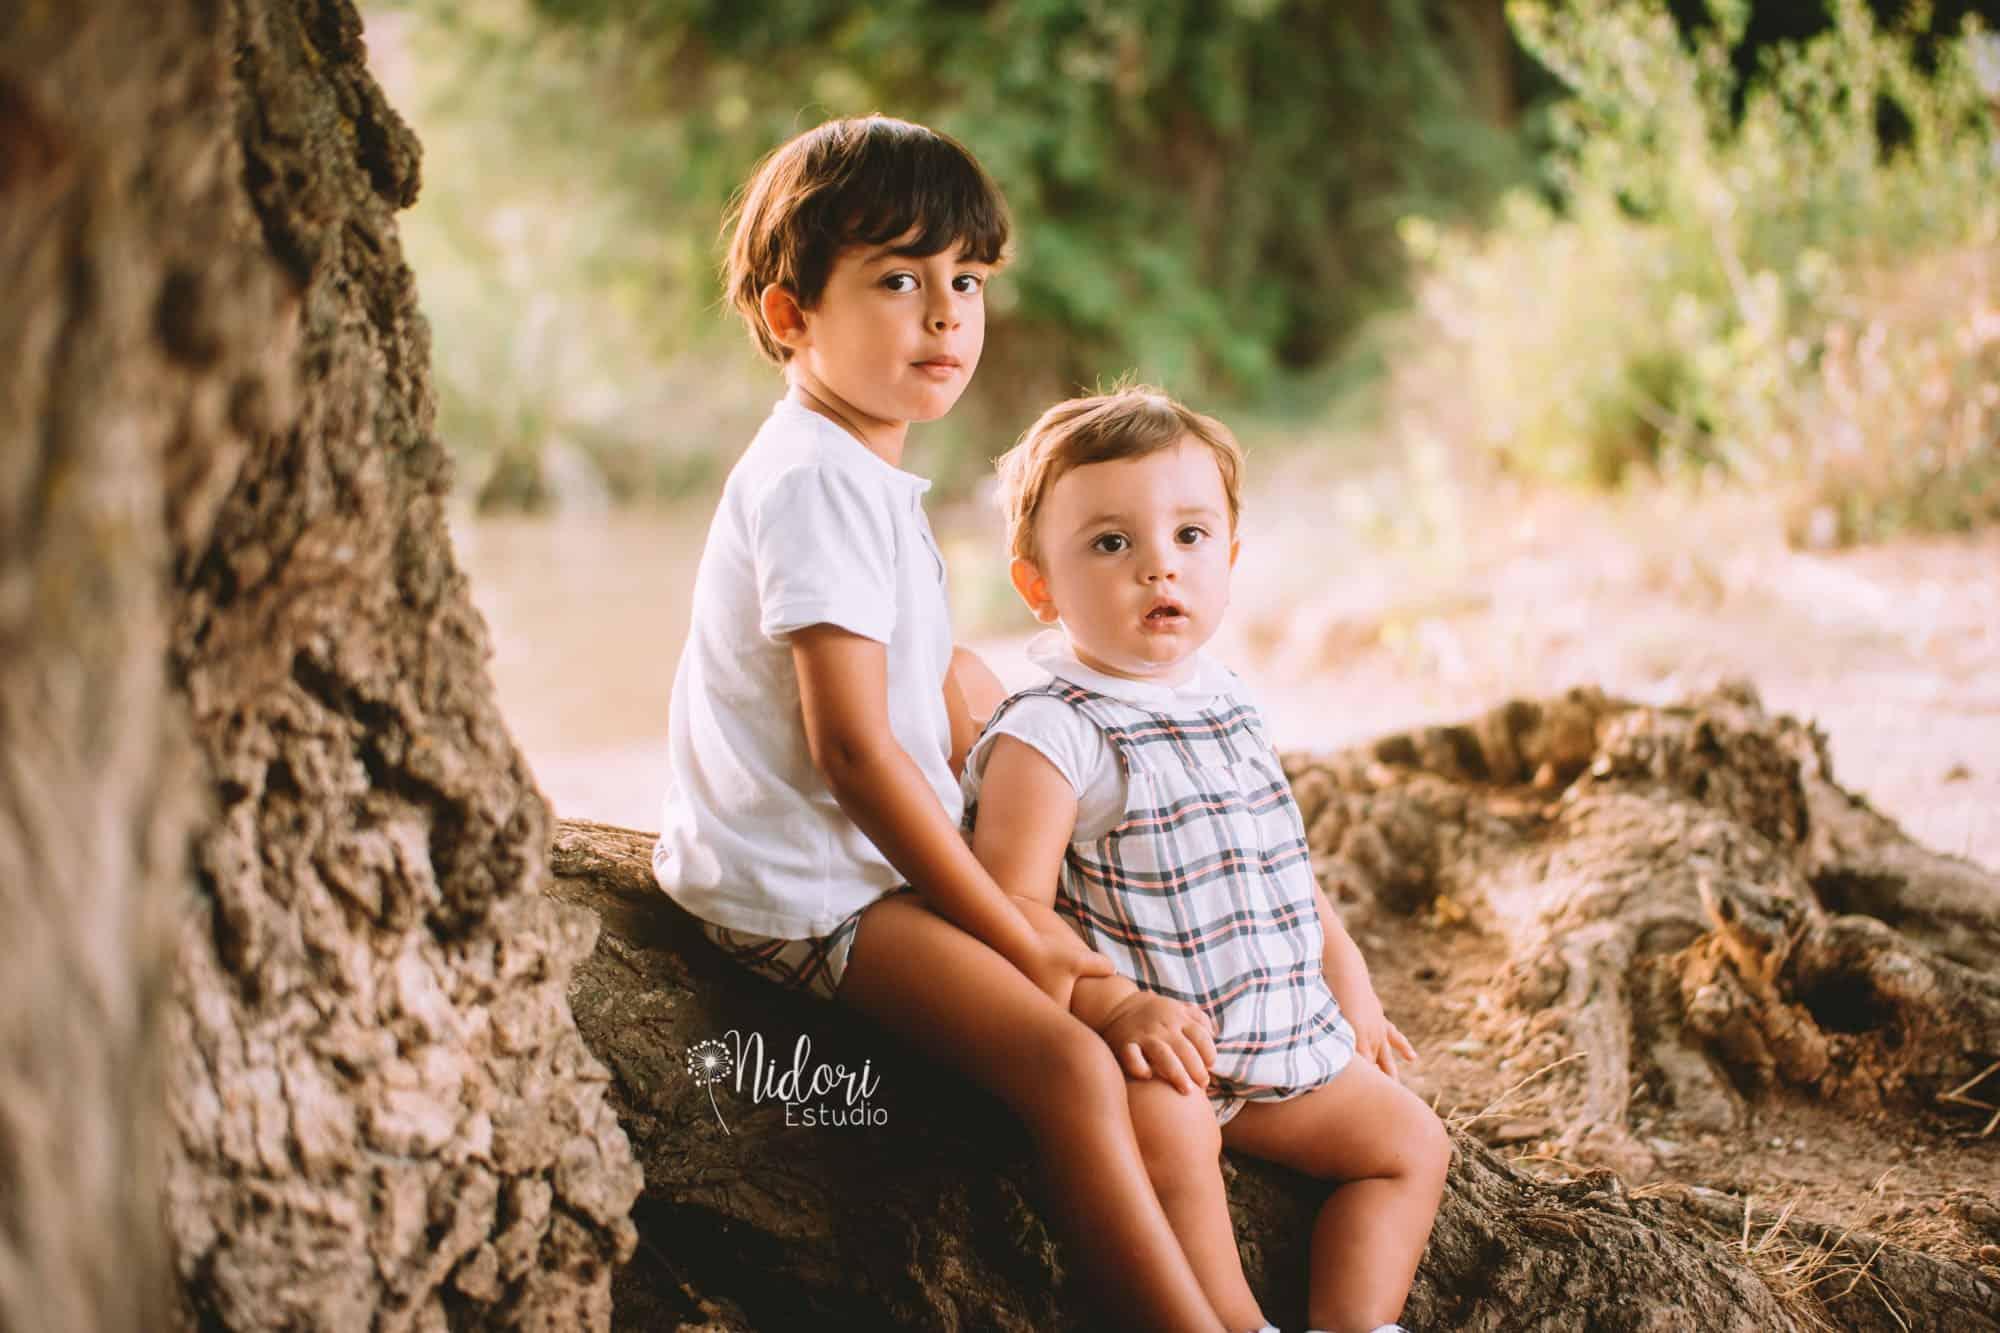 niños-infantiles-sesion-infantil-fotografia-nidoriestudio-fotos-valencia-almazora-castellon-españa-spain-11